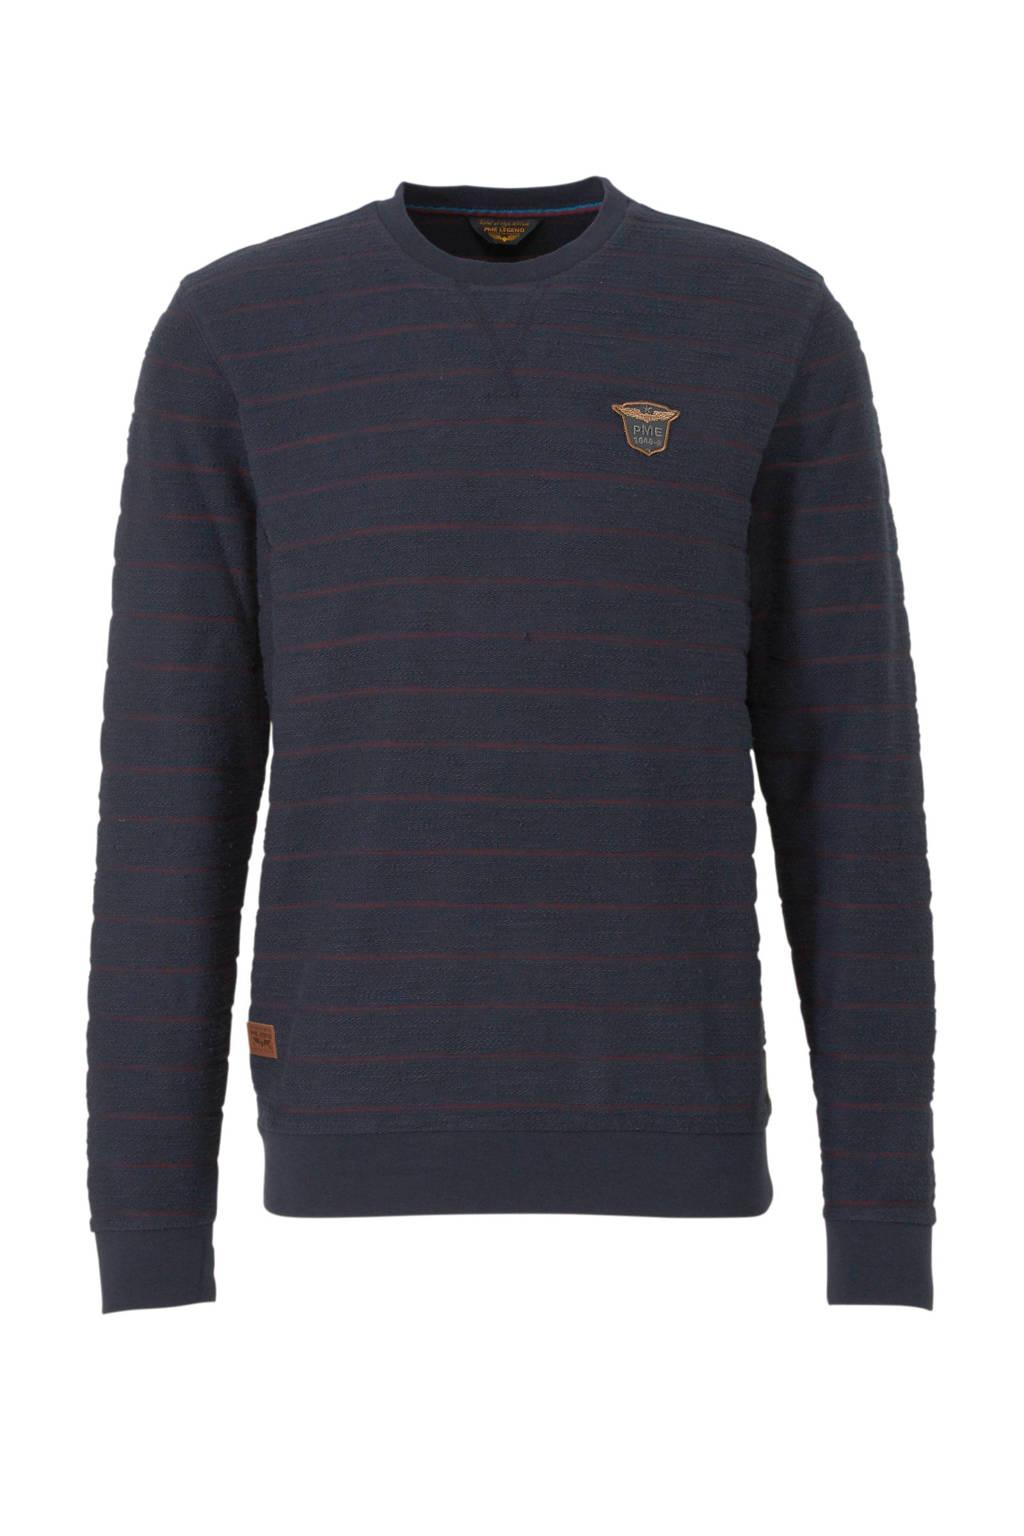 PME Legend gestreept T-shirt donkerblauw, Donkerblauw